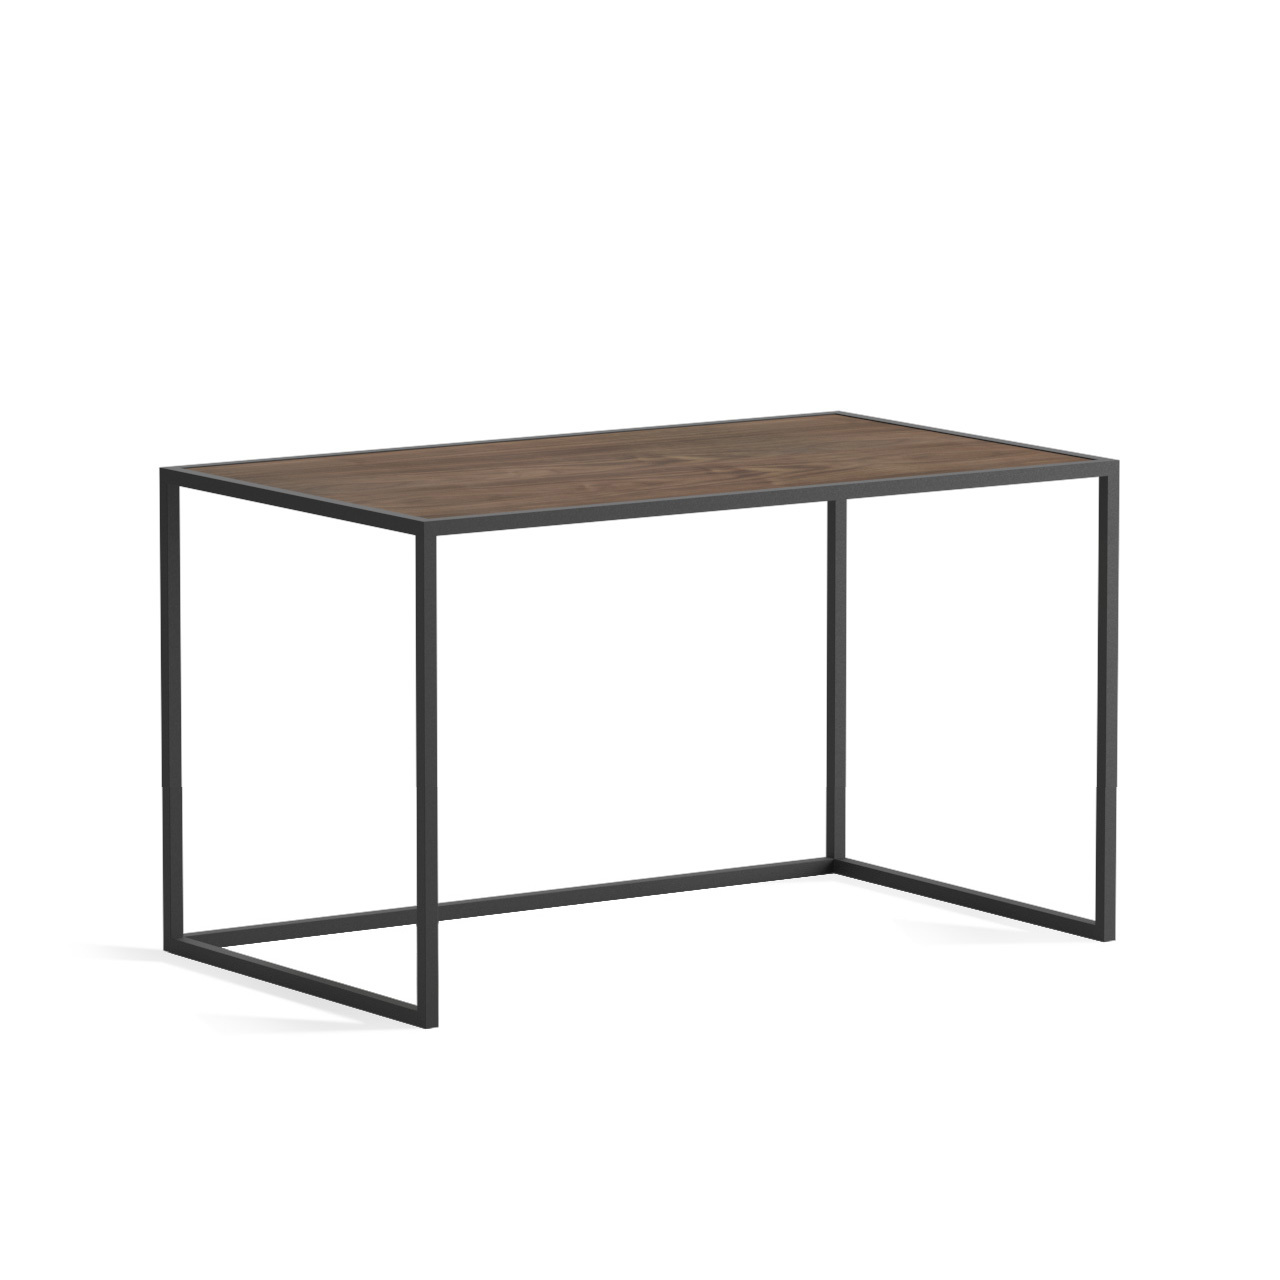 Письменный стол Romero lite black - вид 3